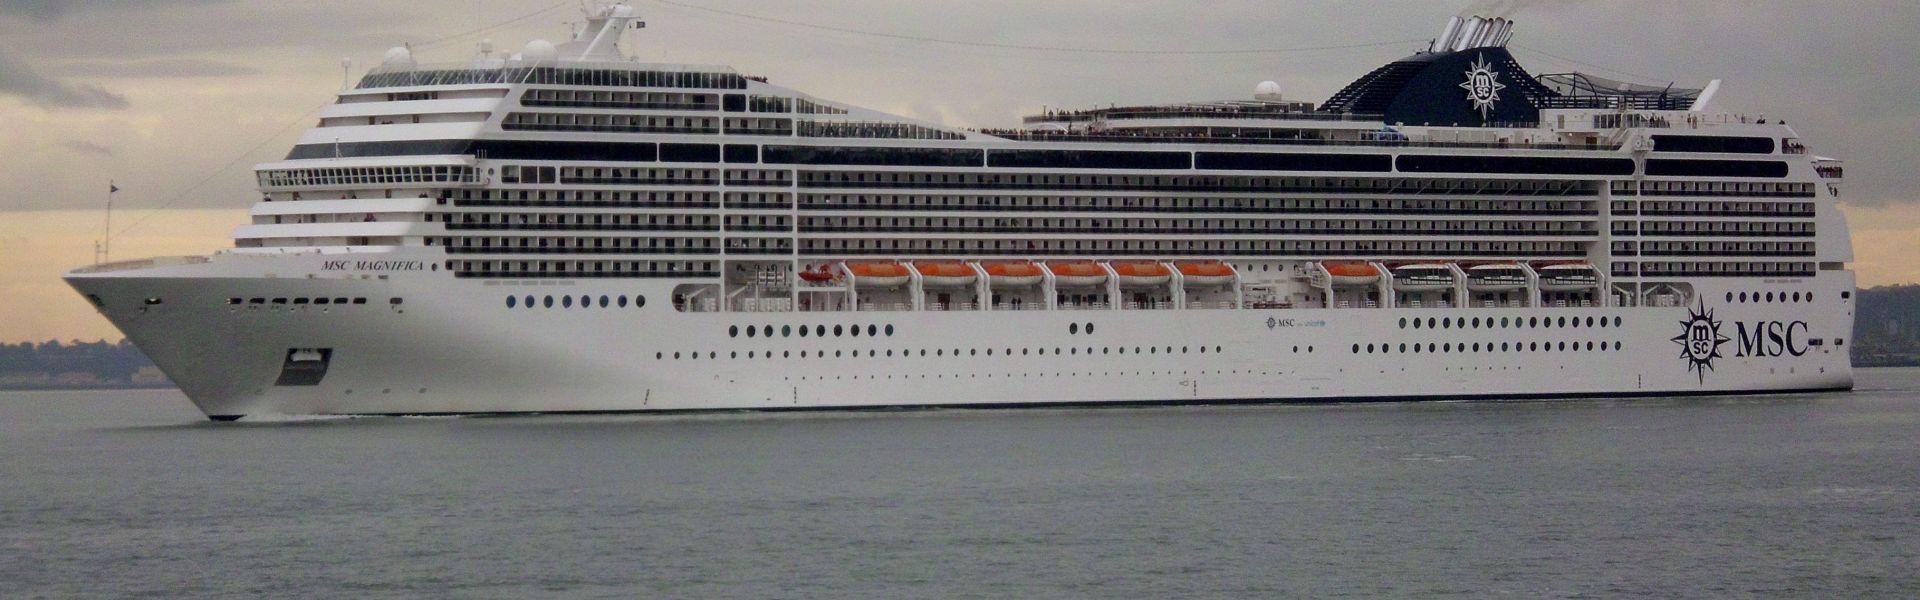 Croaziera 2018 - Coasta Europei/Insulele Britanice (Hamburg) - MSC Cruises - MSC Magnifica - 2 nopti